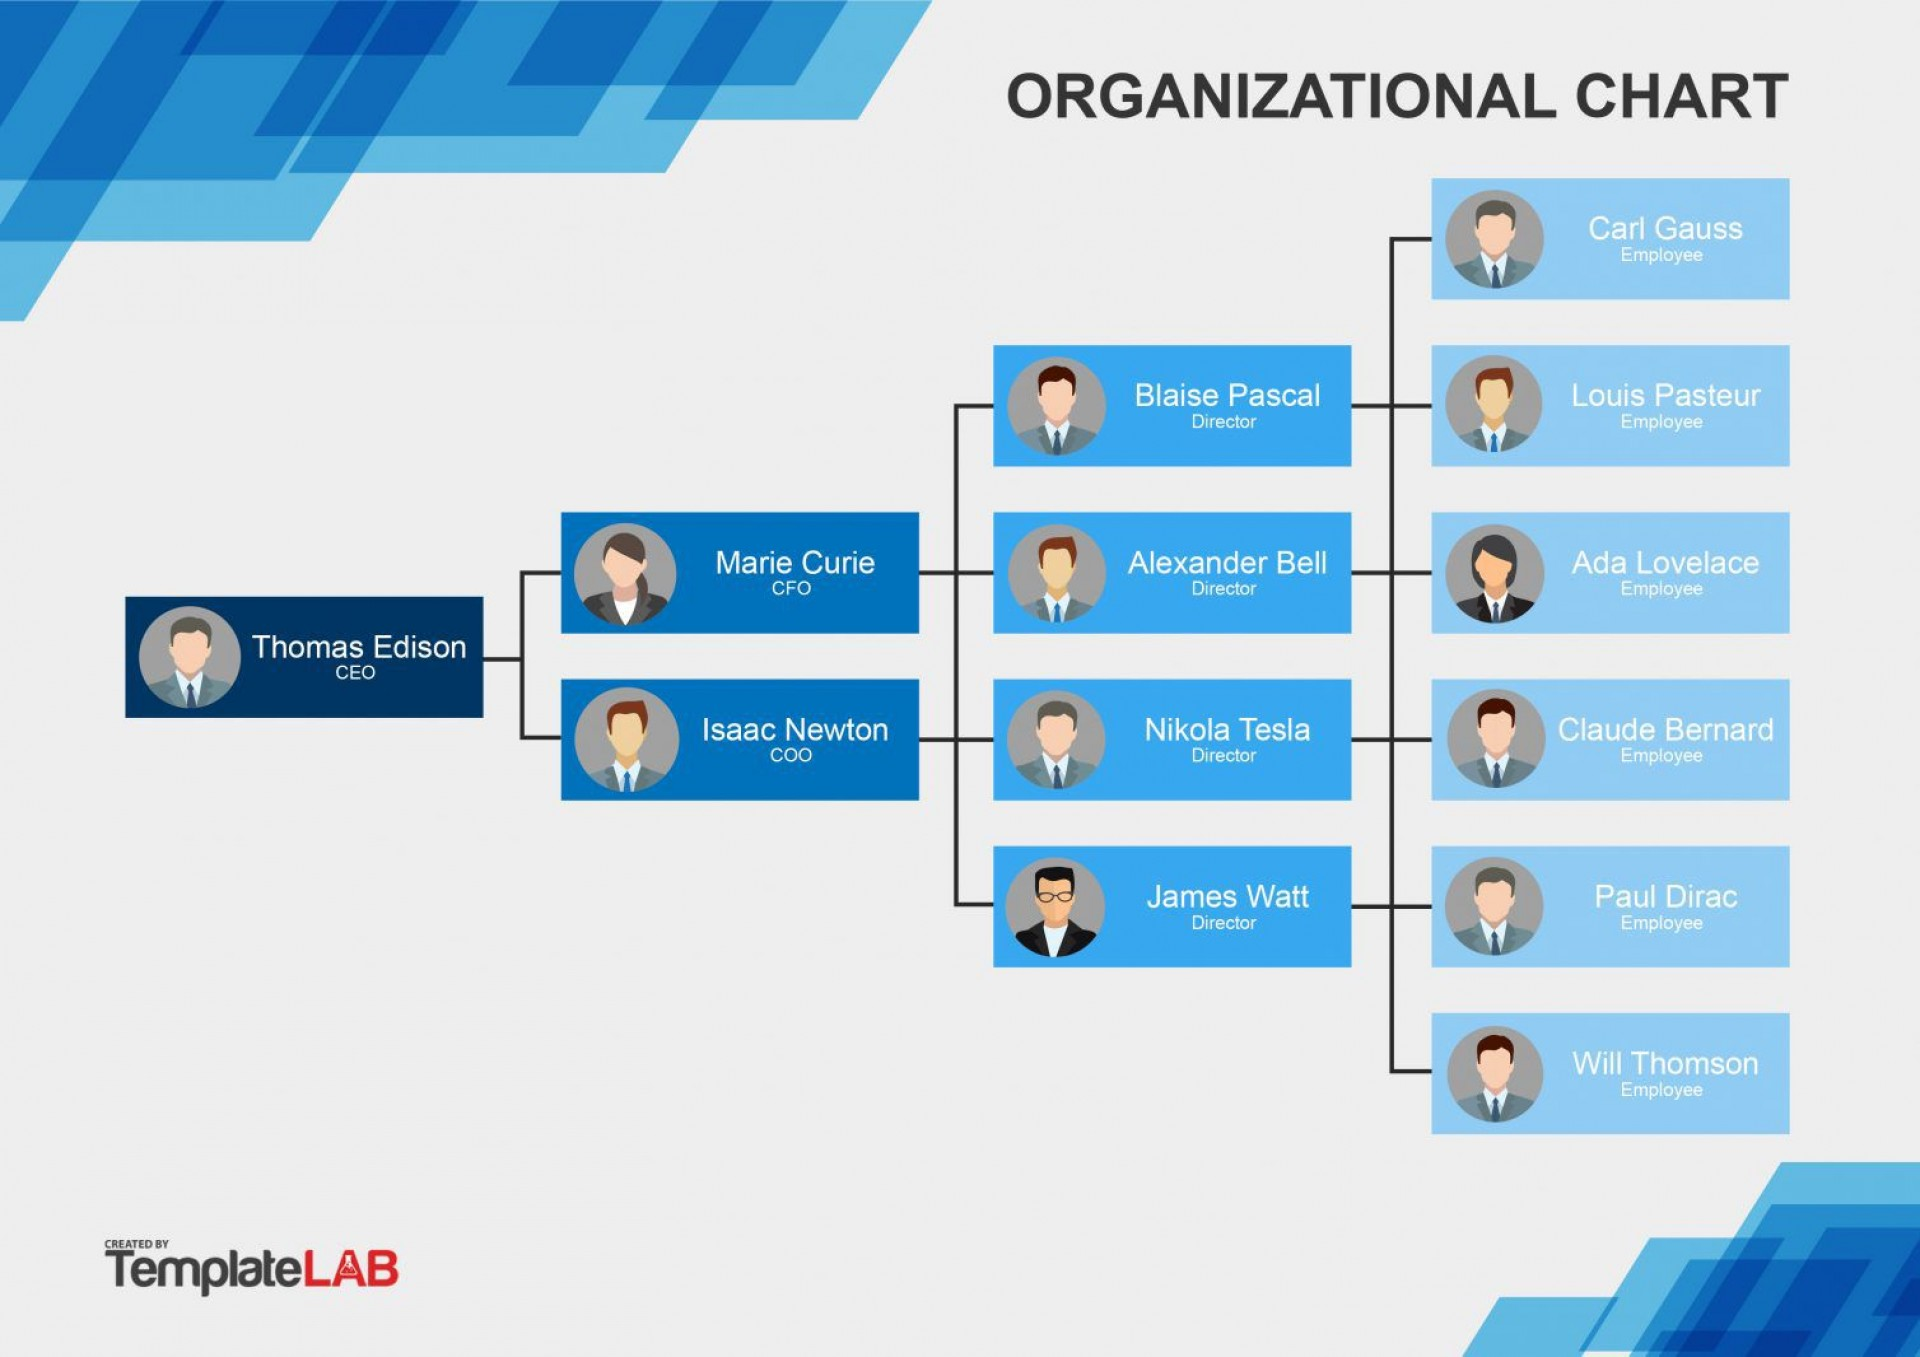 008 Wondrou Org Chart Template Powerpoint Example  Organization Free Download Organizational 2010 20131920